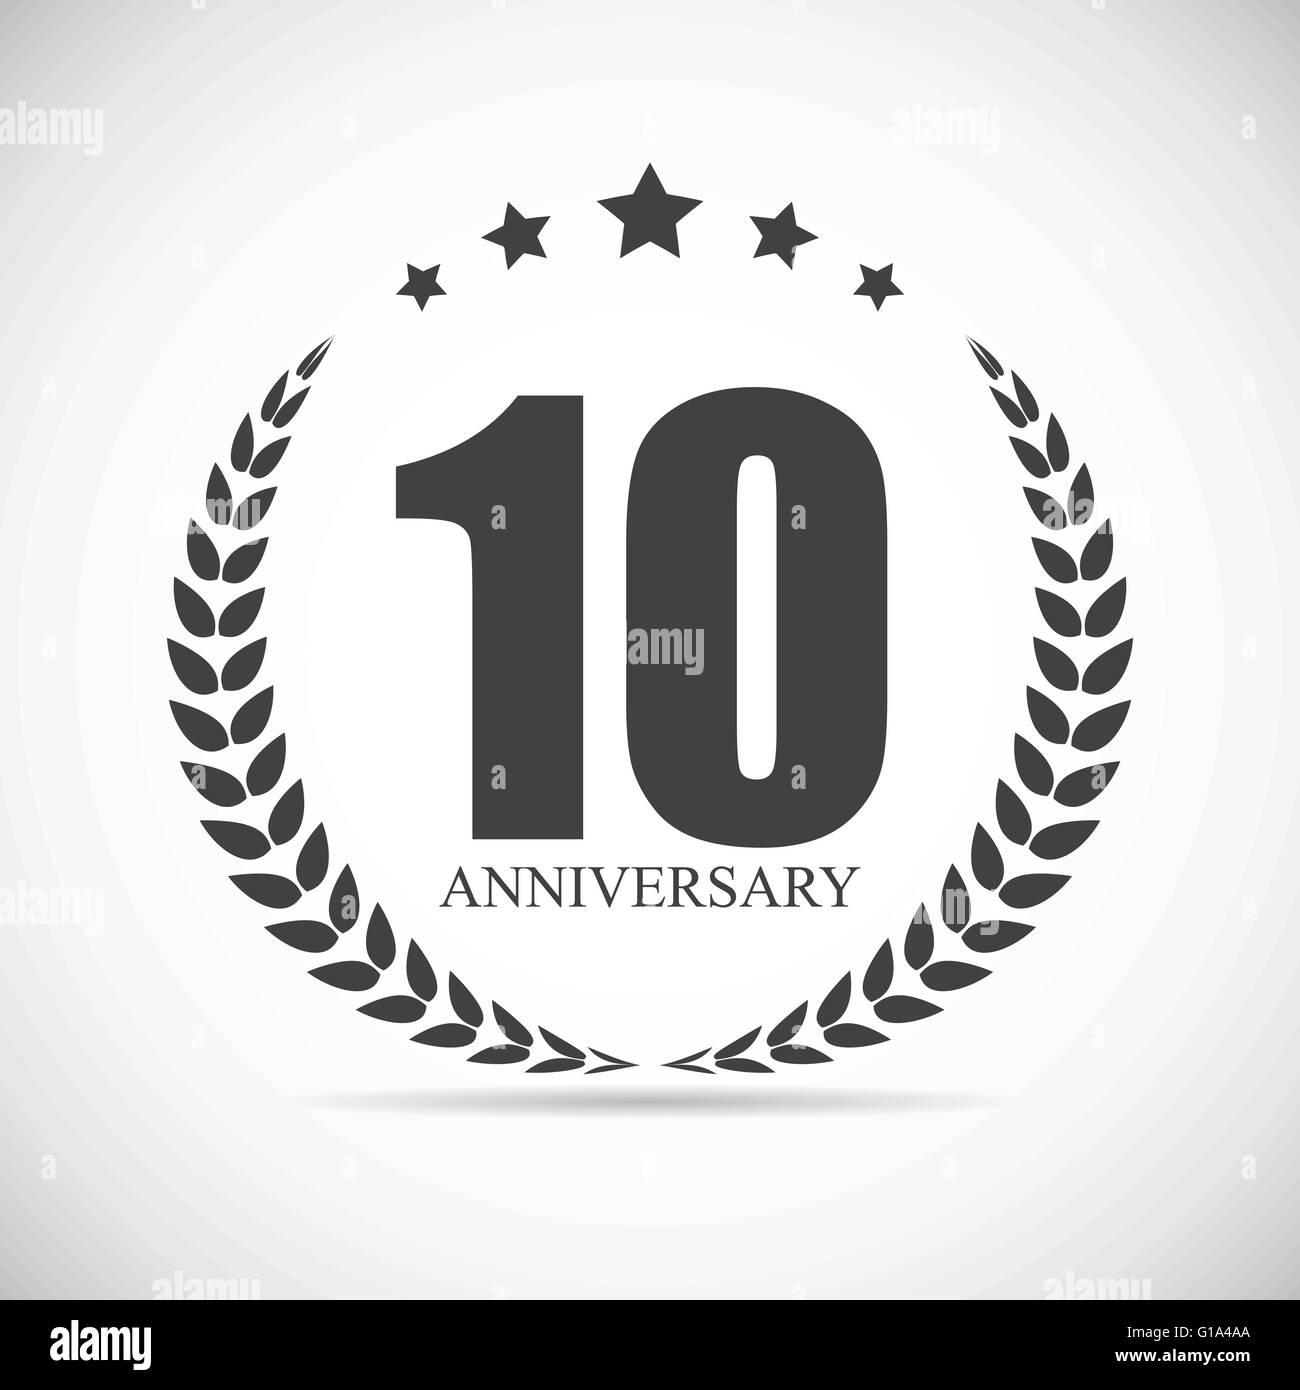 anniversary logo vector - photo #10